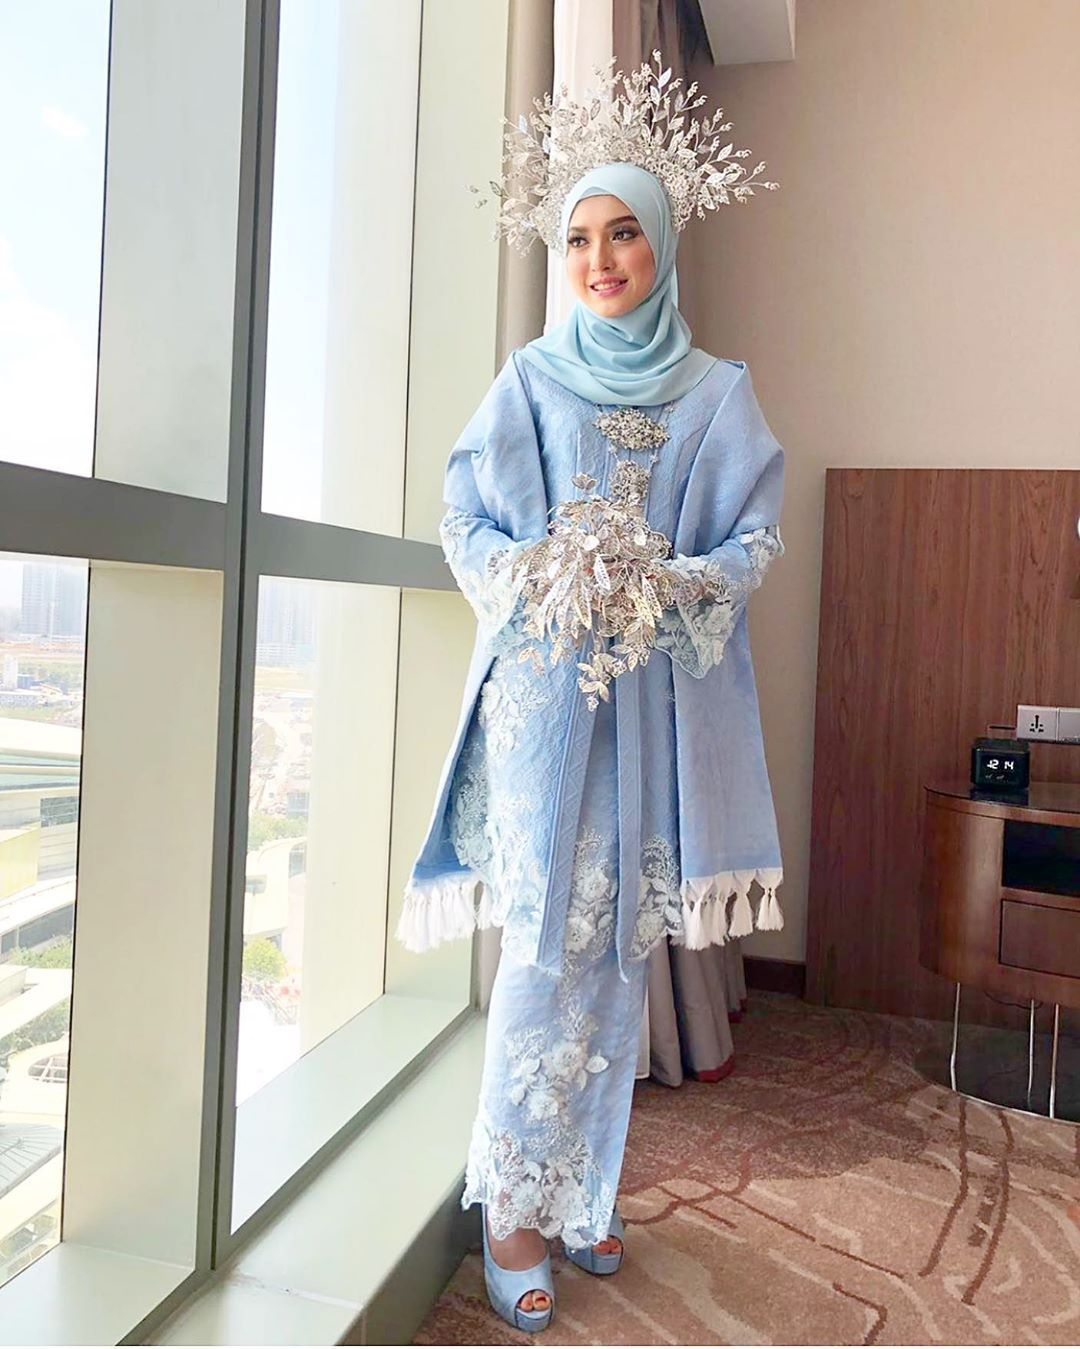 12,12 Likes, 12 Comments - Malay Wedding Dress (@malayweddingdress